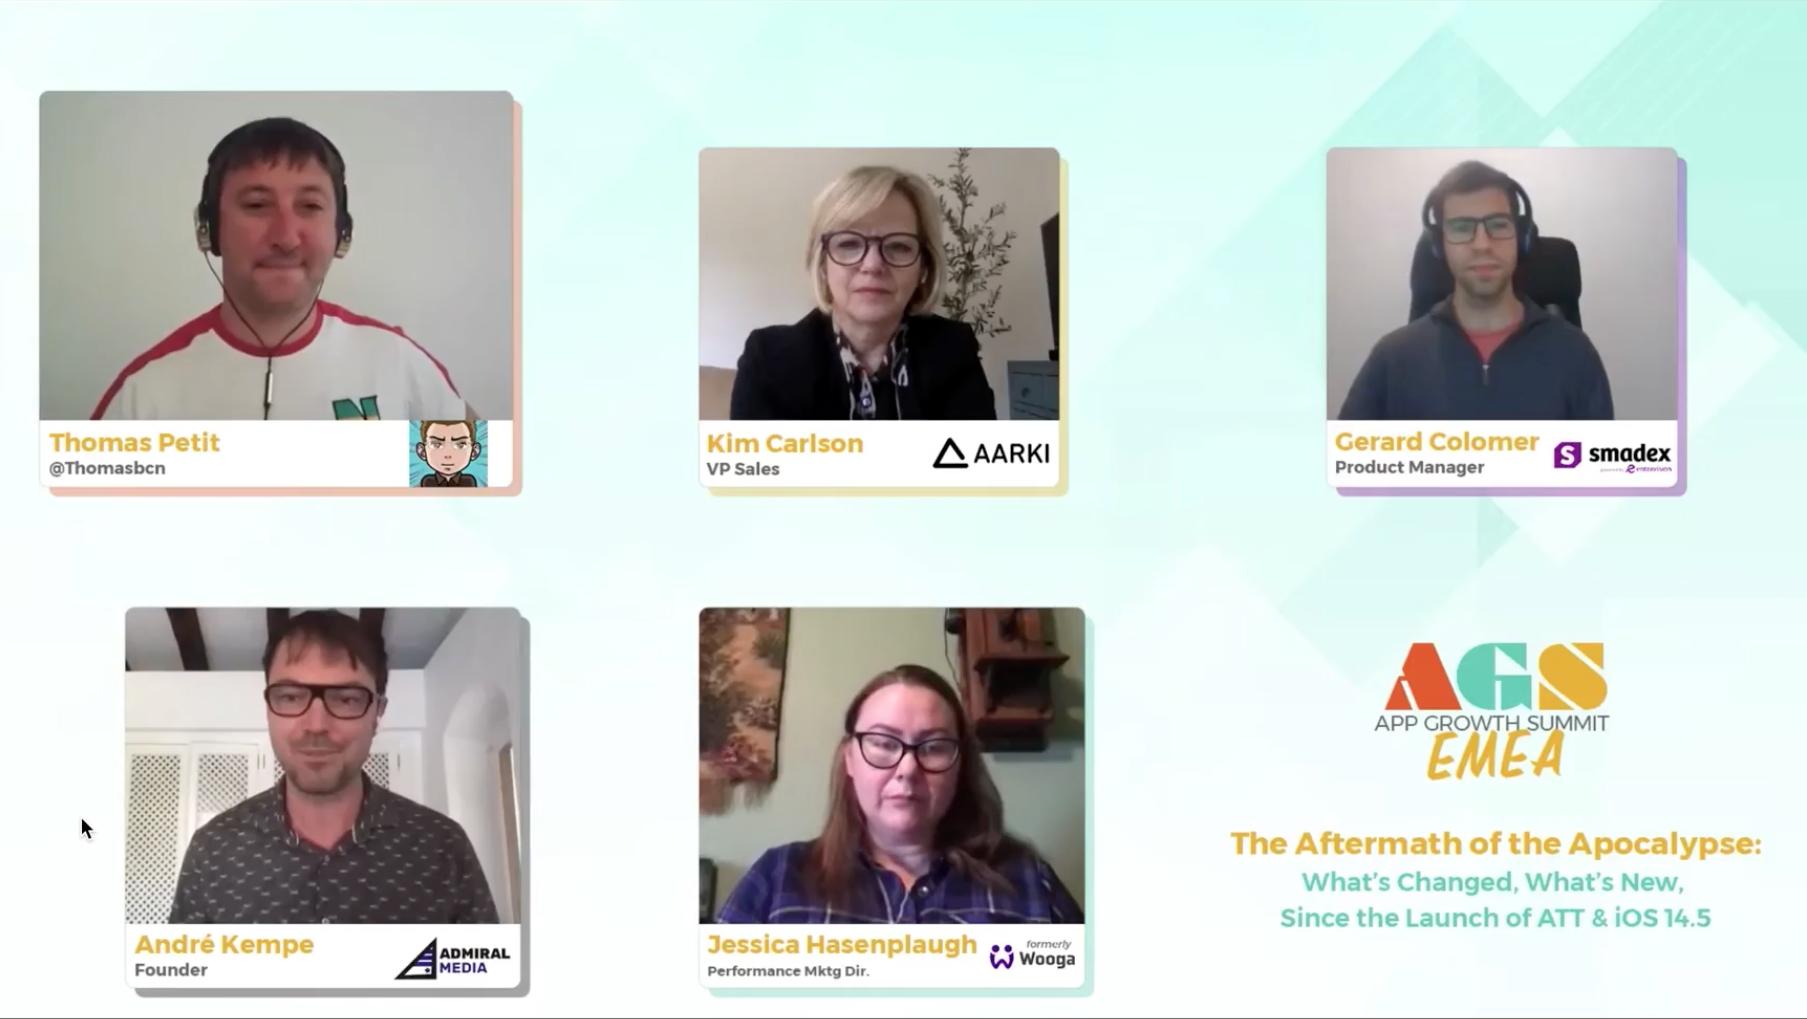 Aarki at App Growth Summit EMEA with Thomasbcn Admiral Media Wooga Smadex on Apple iOS14 ATT Panel